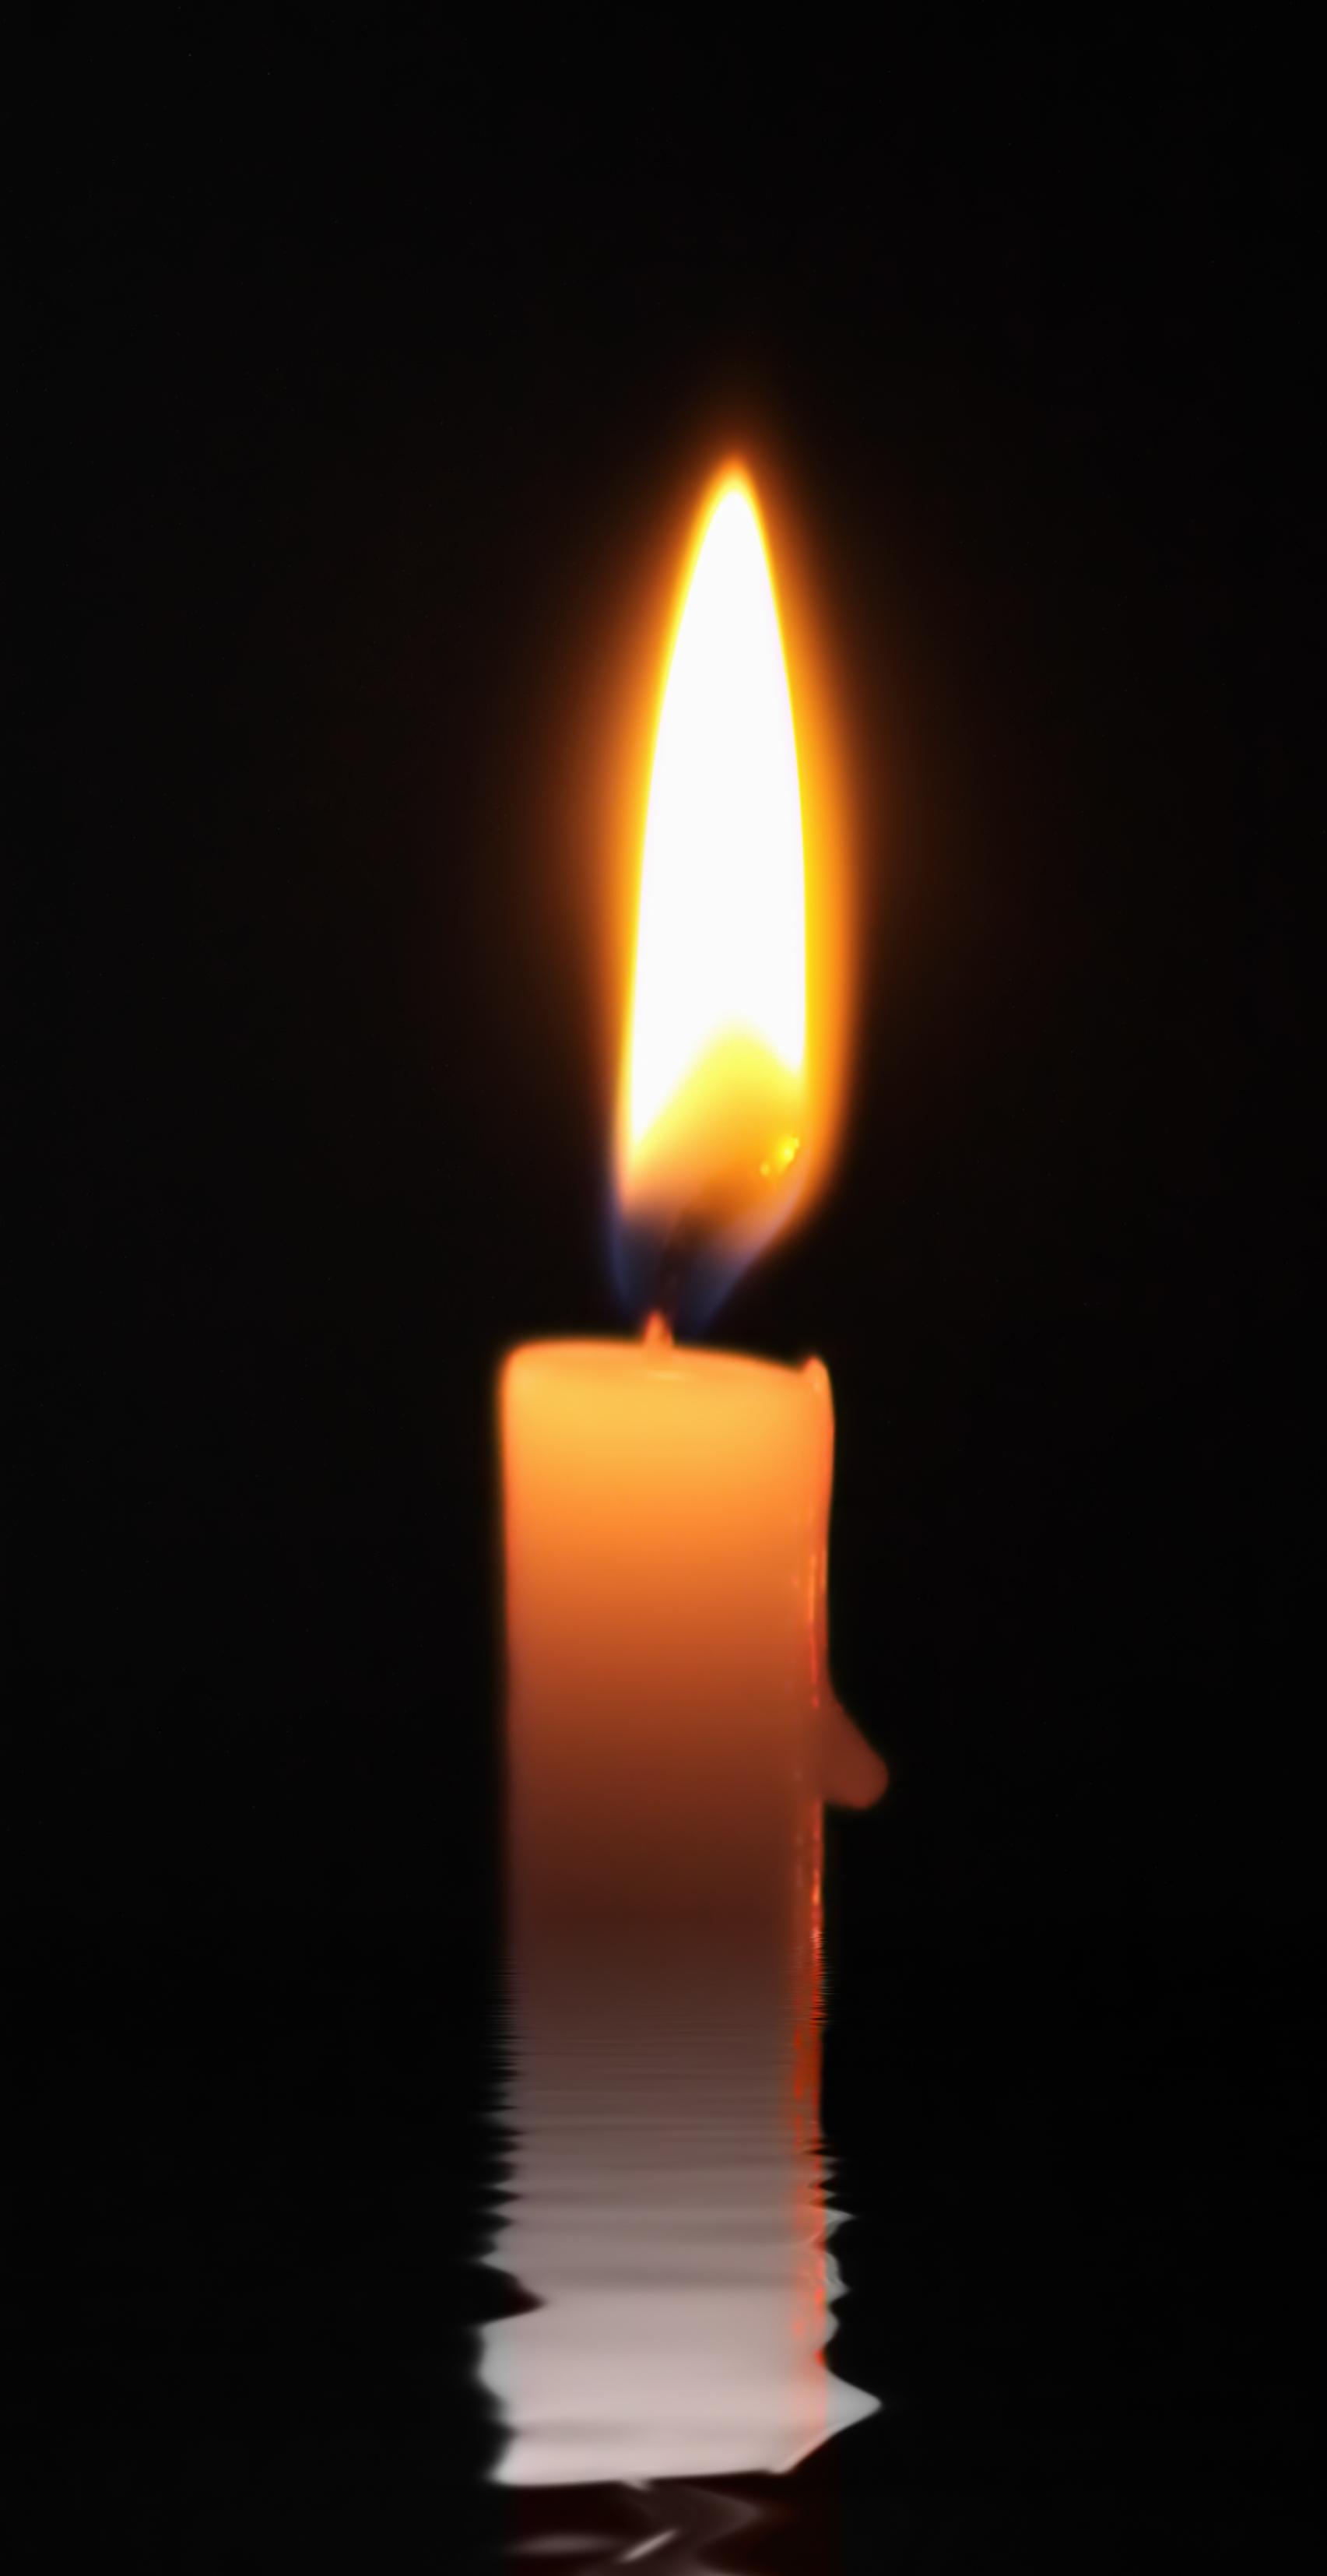 За минувшие сутки один воин погиб и один ранен, - спикер АТО - Цензор.НЕТ 823